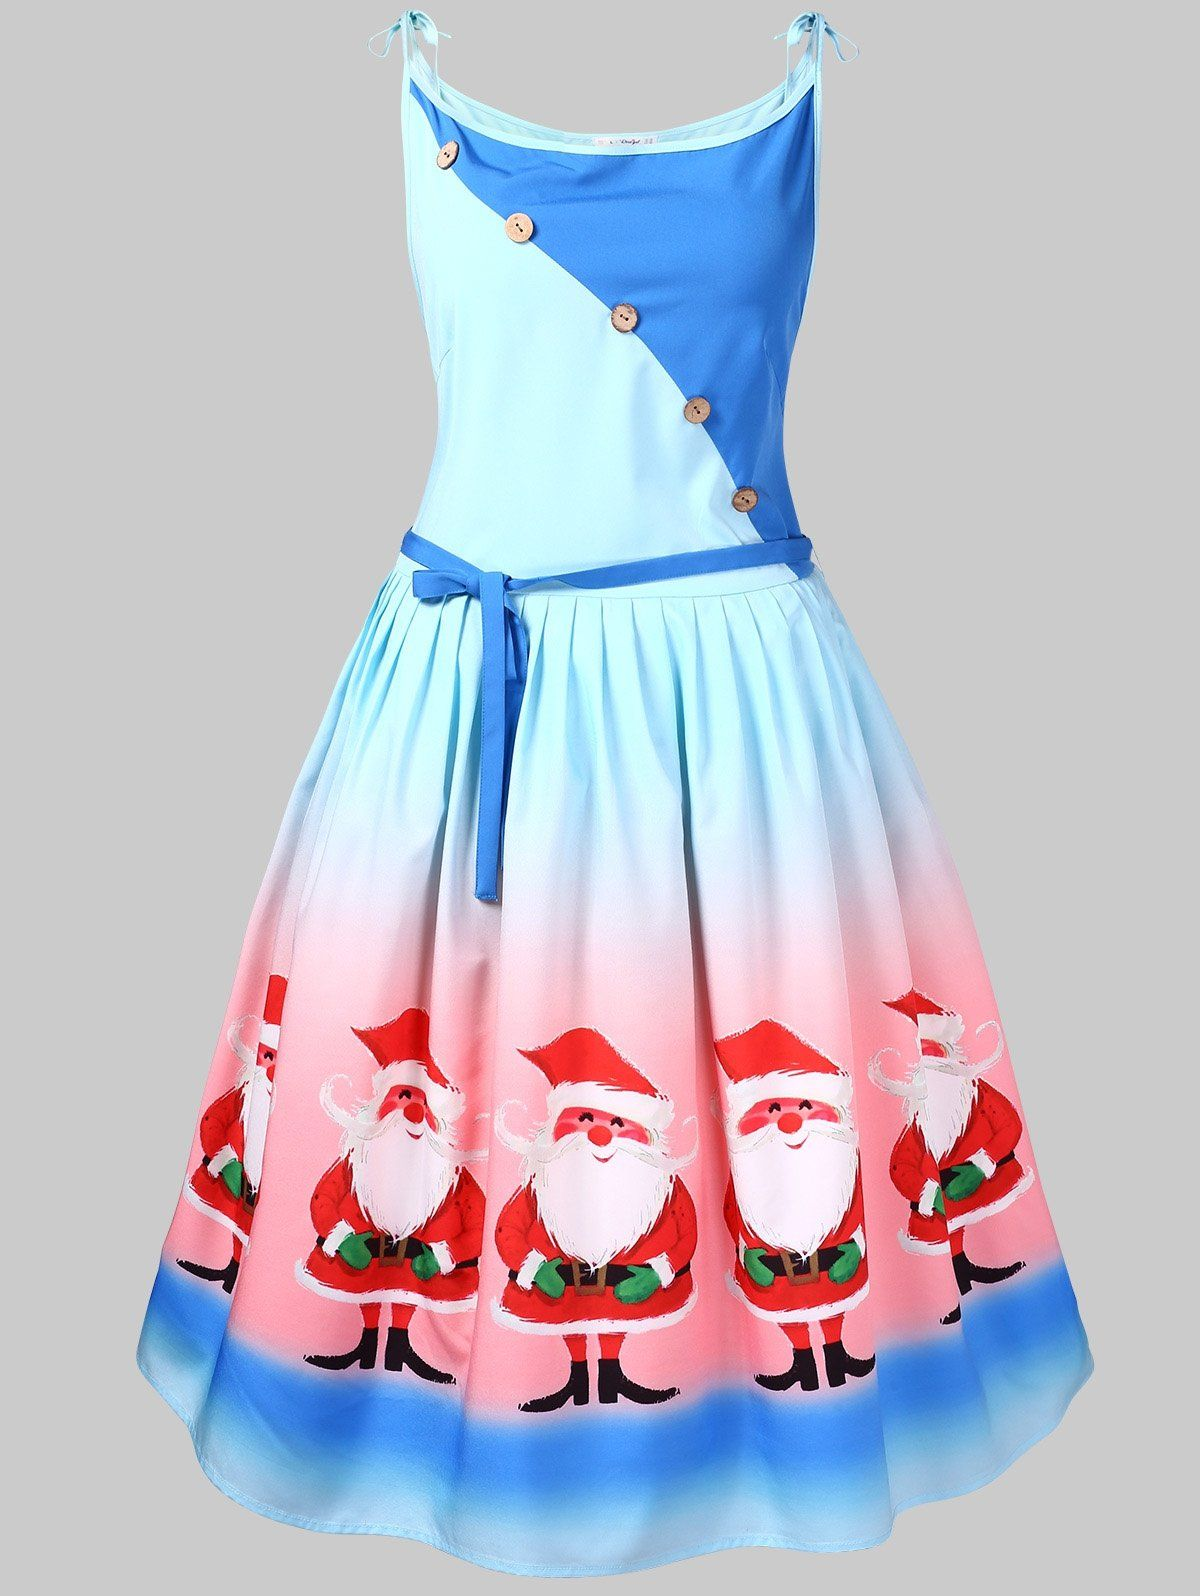 a2ccb2a73a Plus Size Santa Claus Print Christmas Flare Dress